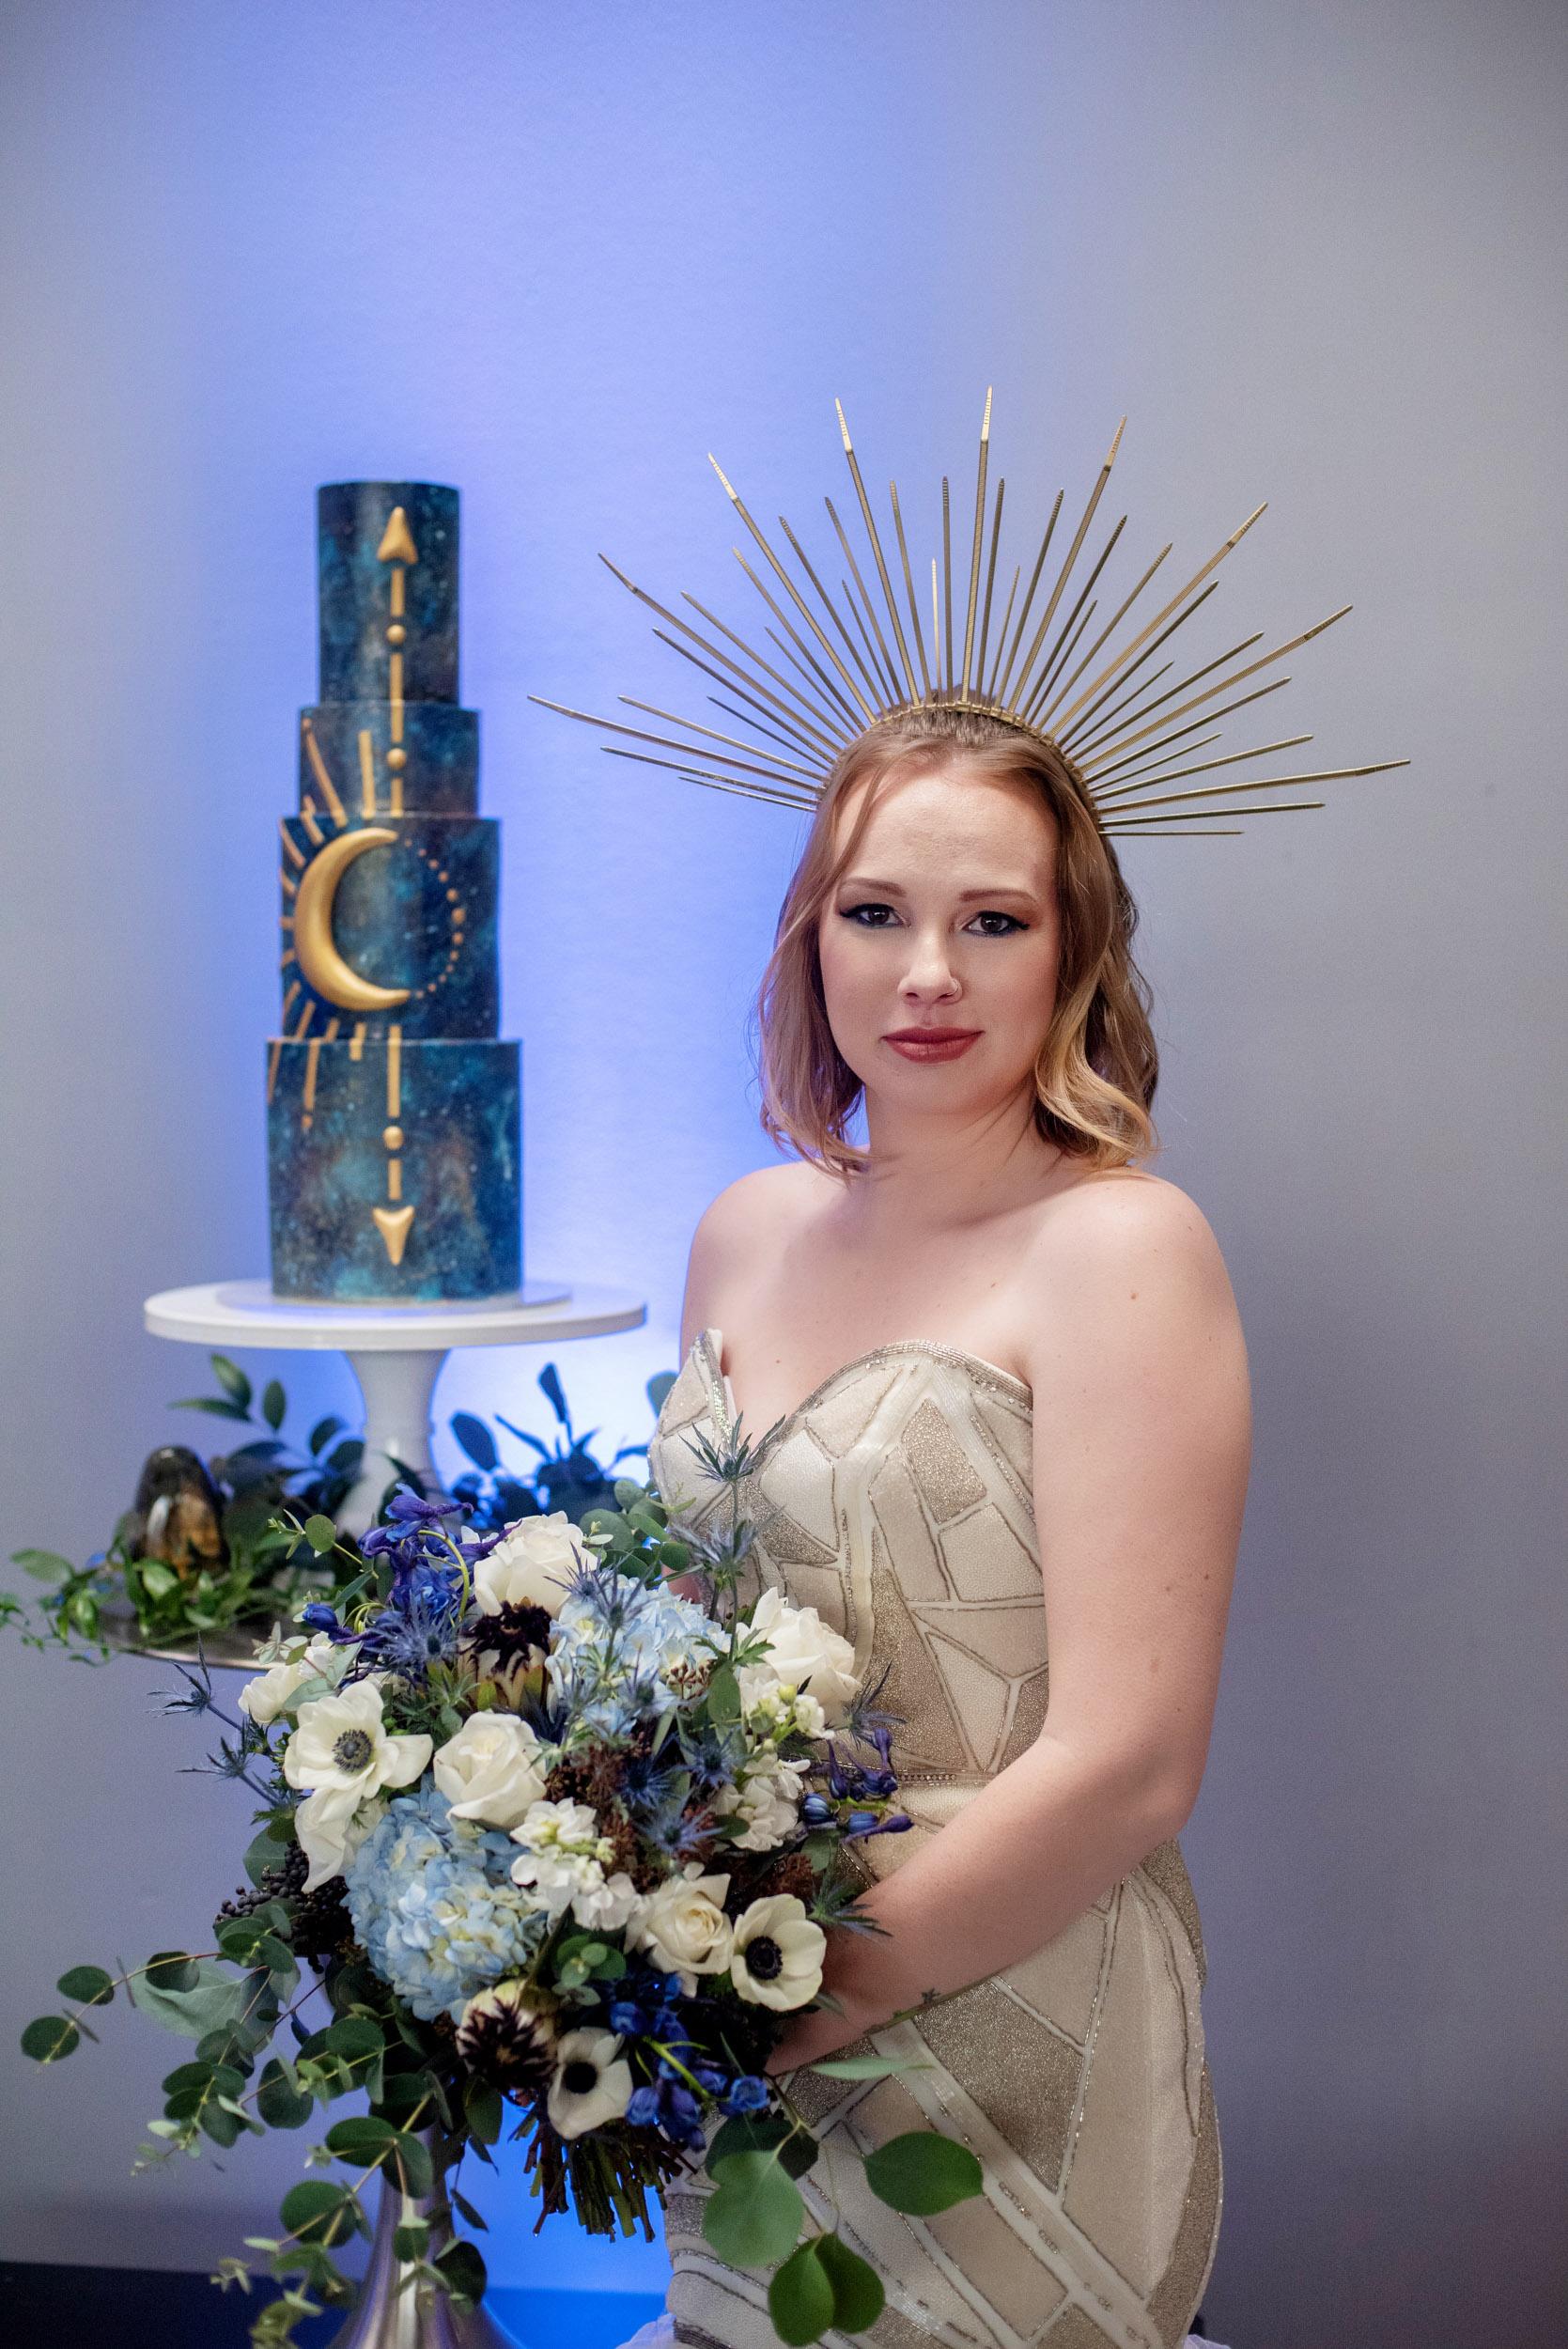 crystals, bohemian, boho, eucalyptus, anemone, protea, luxury wedding cake, sewell sweets, celestial wedding, hayley paige gown, ivory wedding gown, goddess, magic, wiccan wedding magic wedding, witch wedding